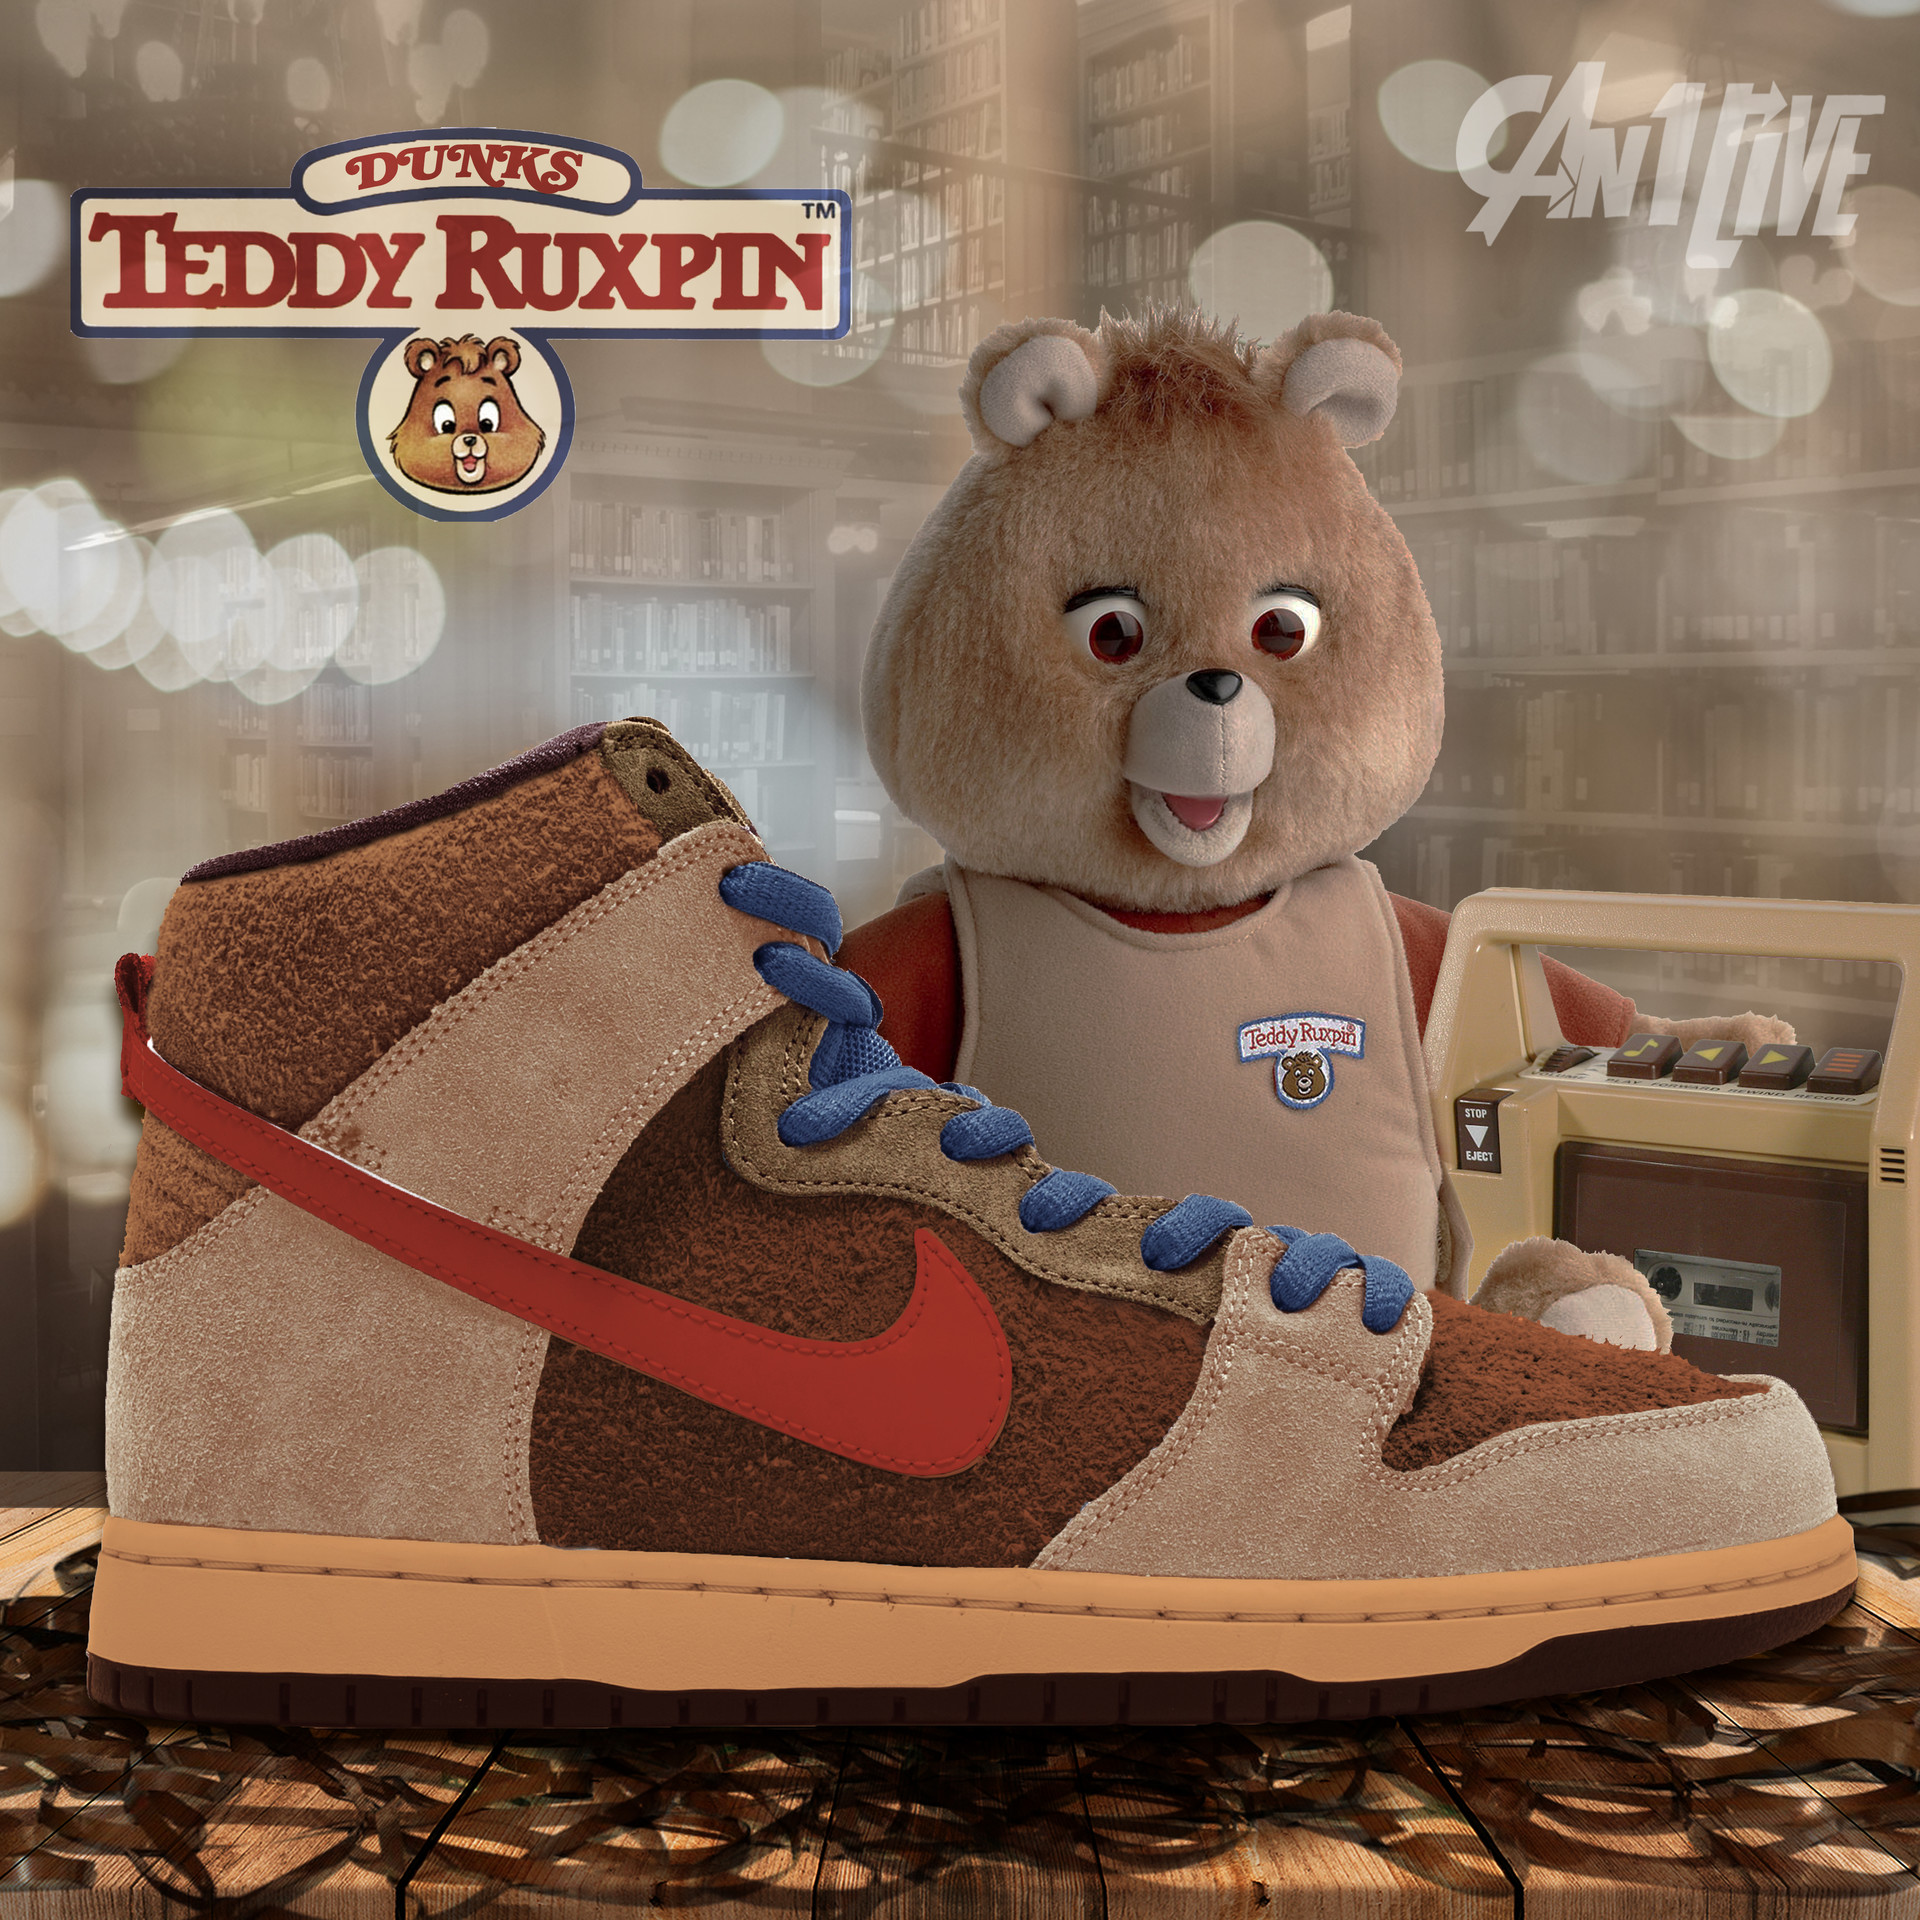 Hunter george teddy ruxpin dunk high